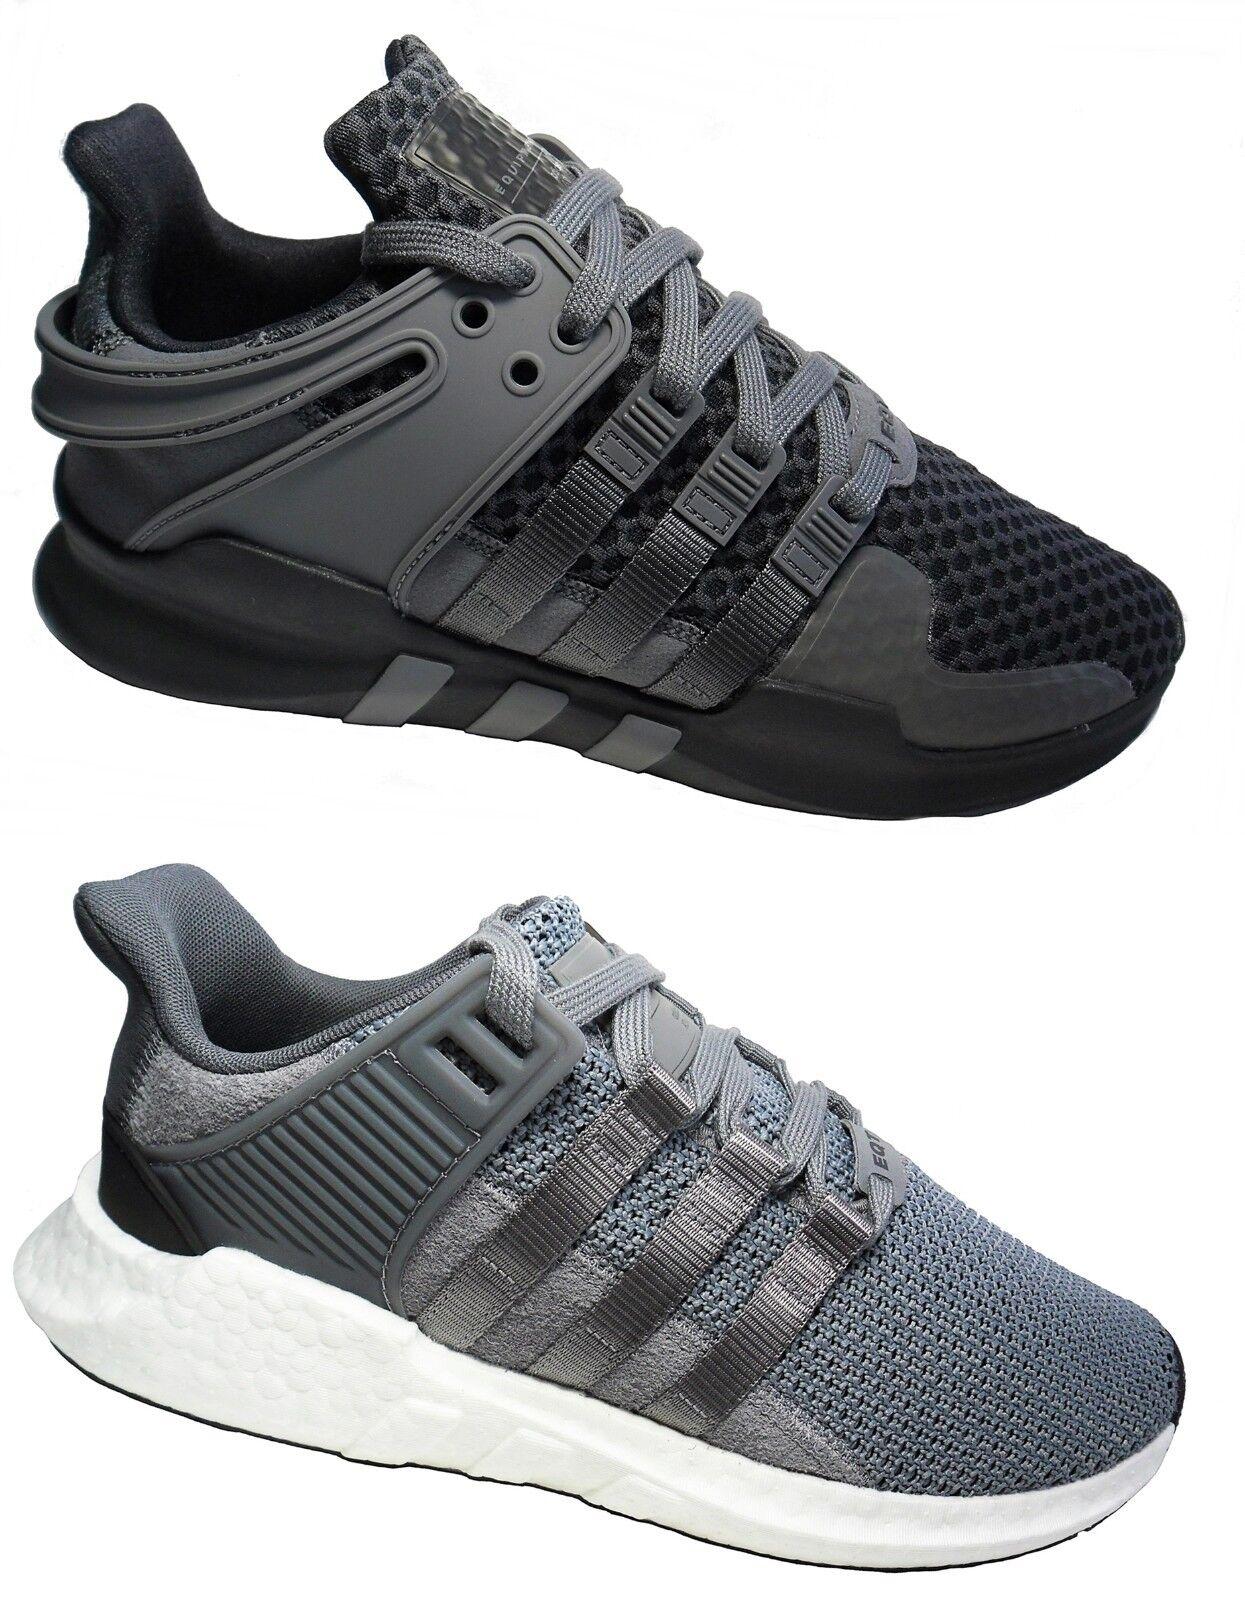 Mens Adidas Originals EQT Equipment Support Adv Advance Trainers New Size 7 12.5